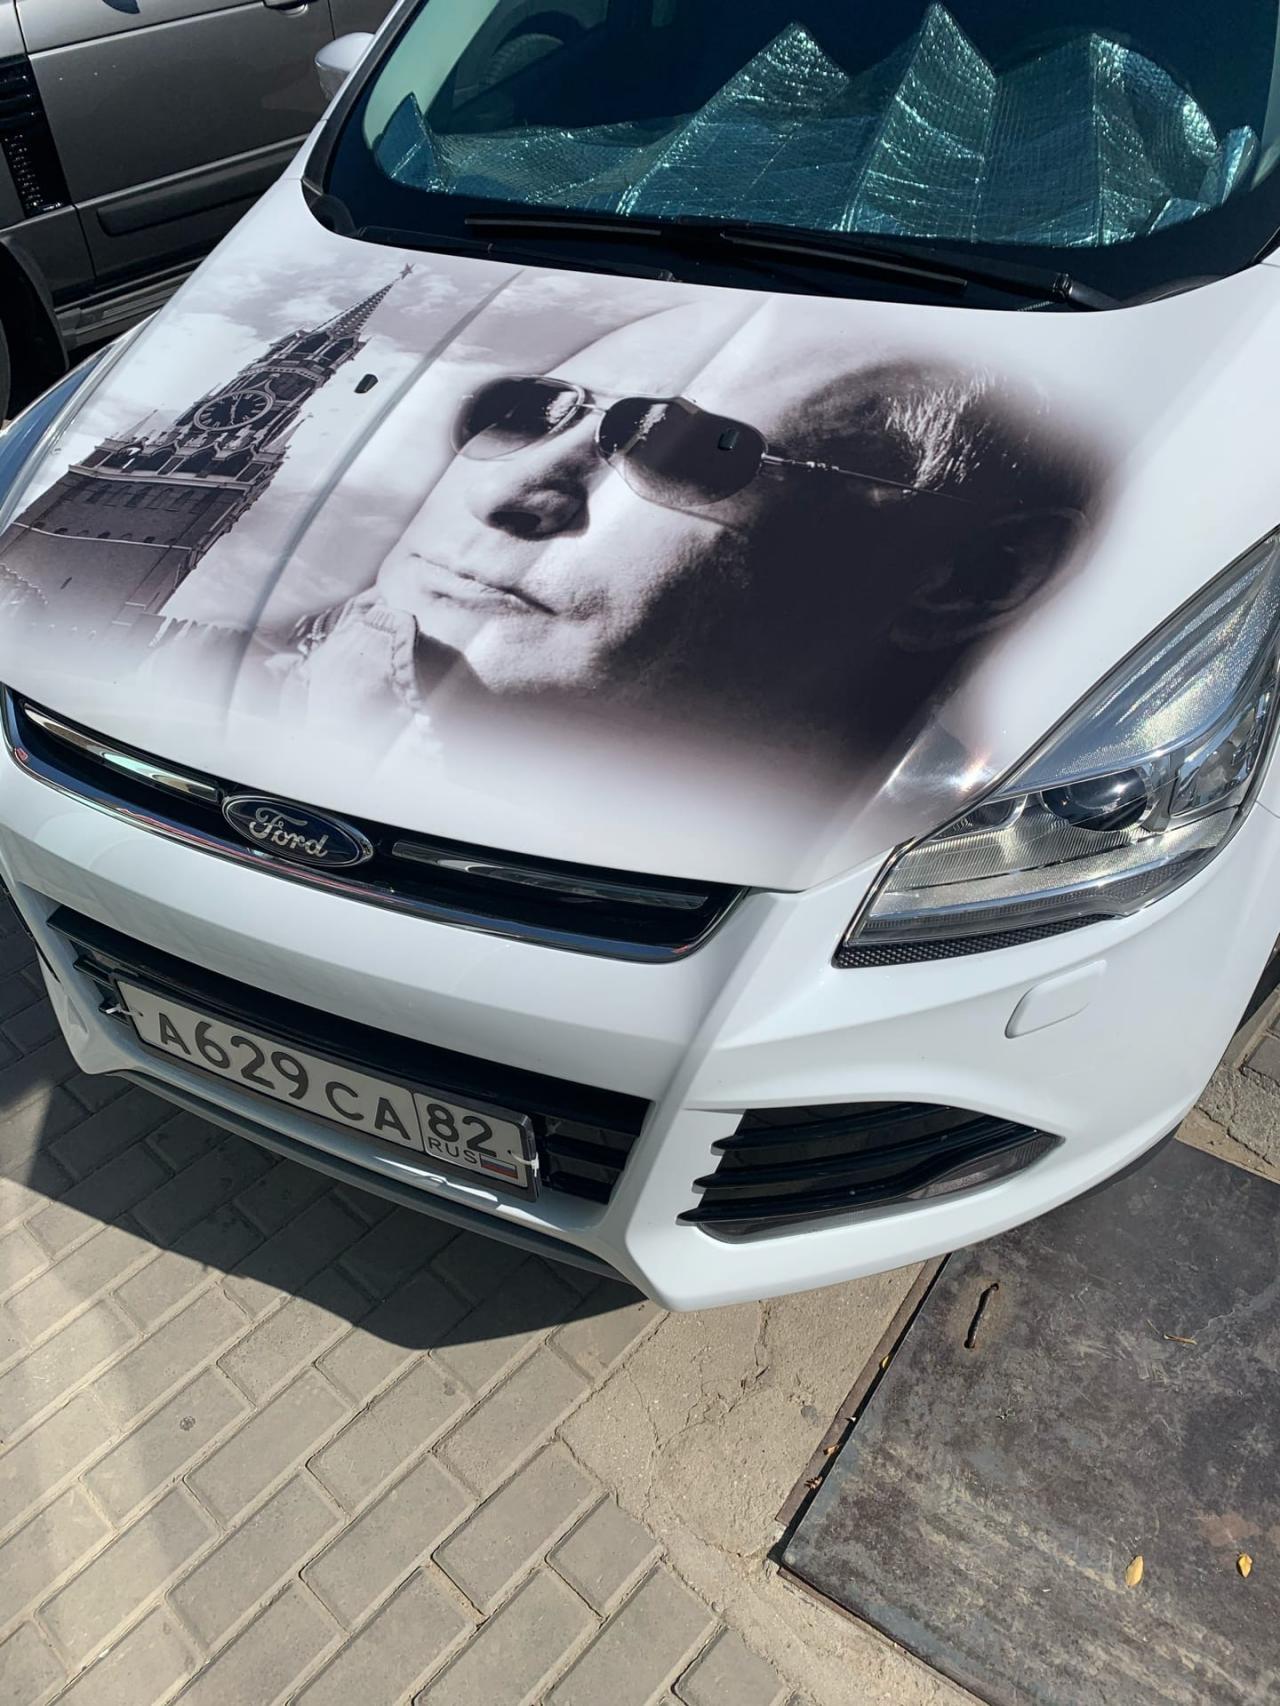 Как реагируют сотрудники ДПС на Путинмобиль